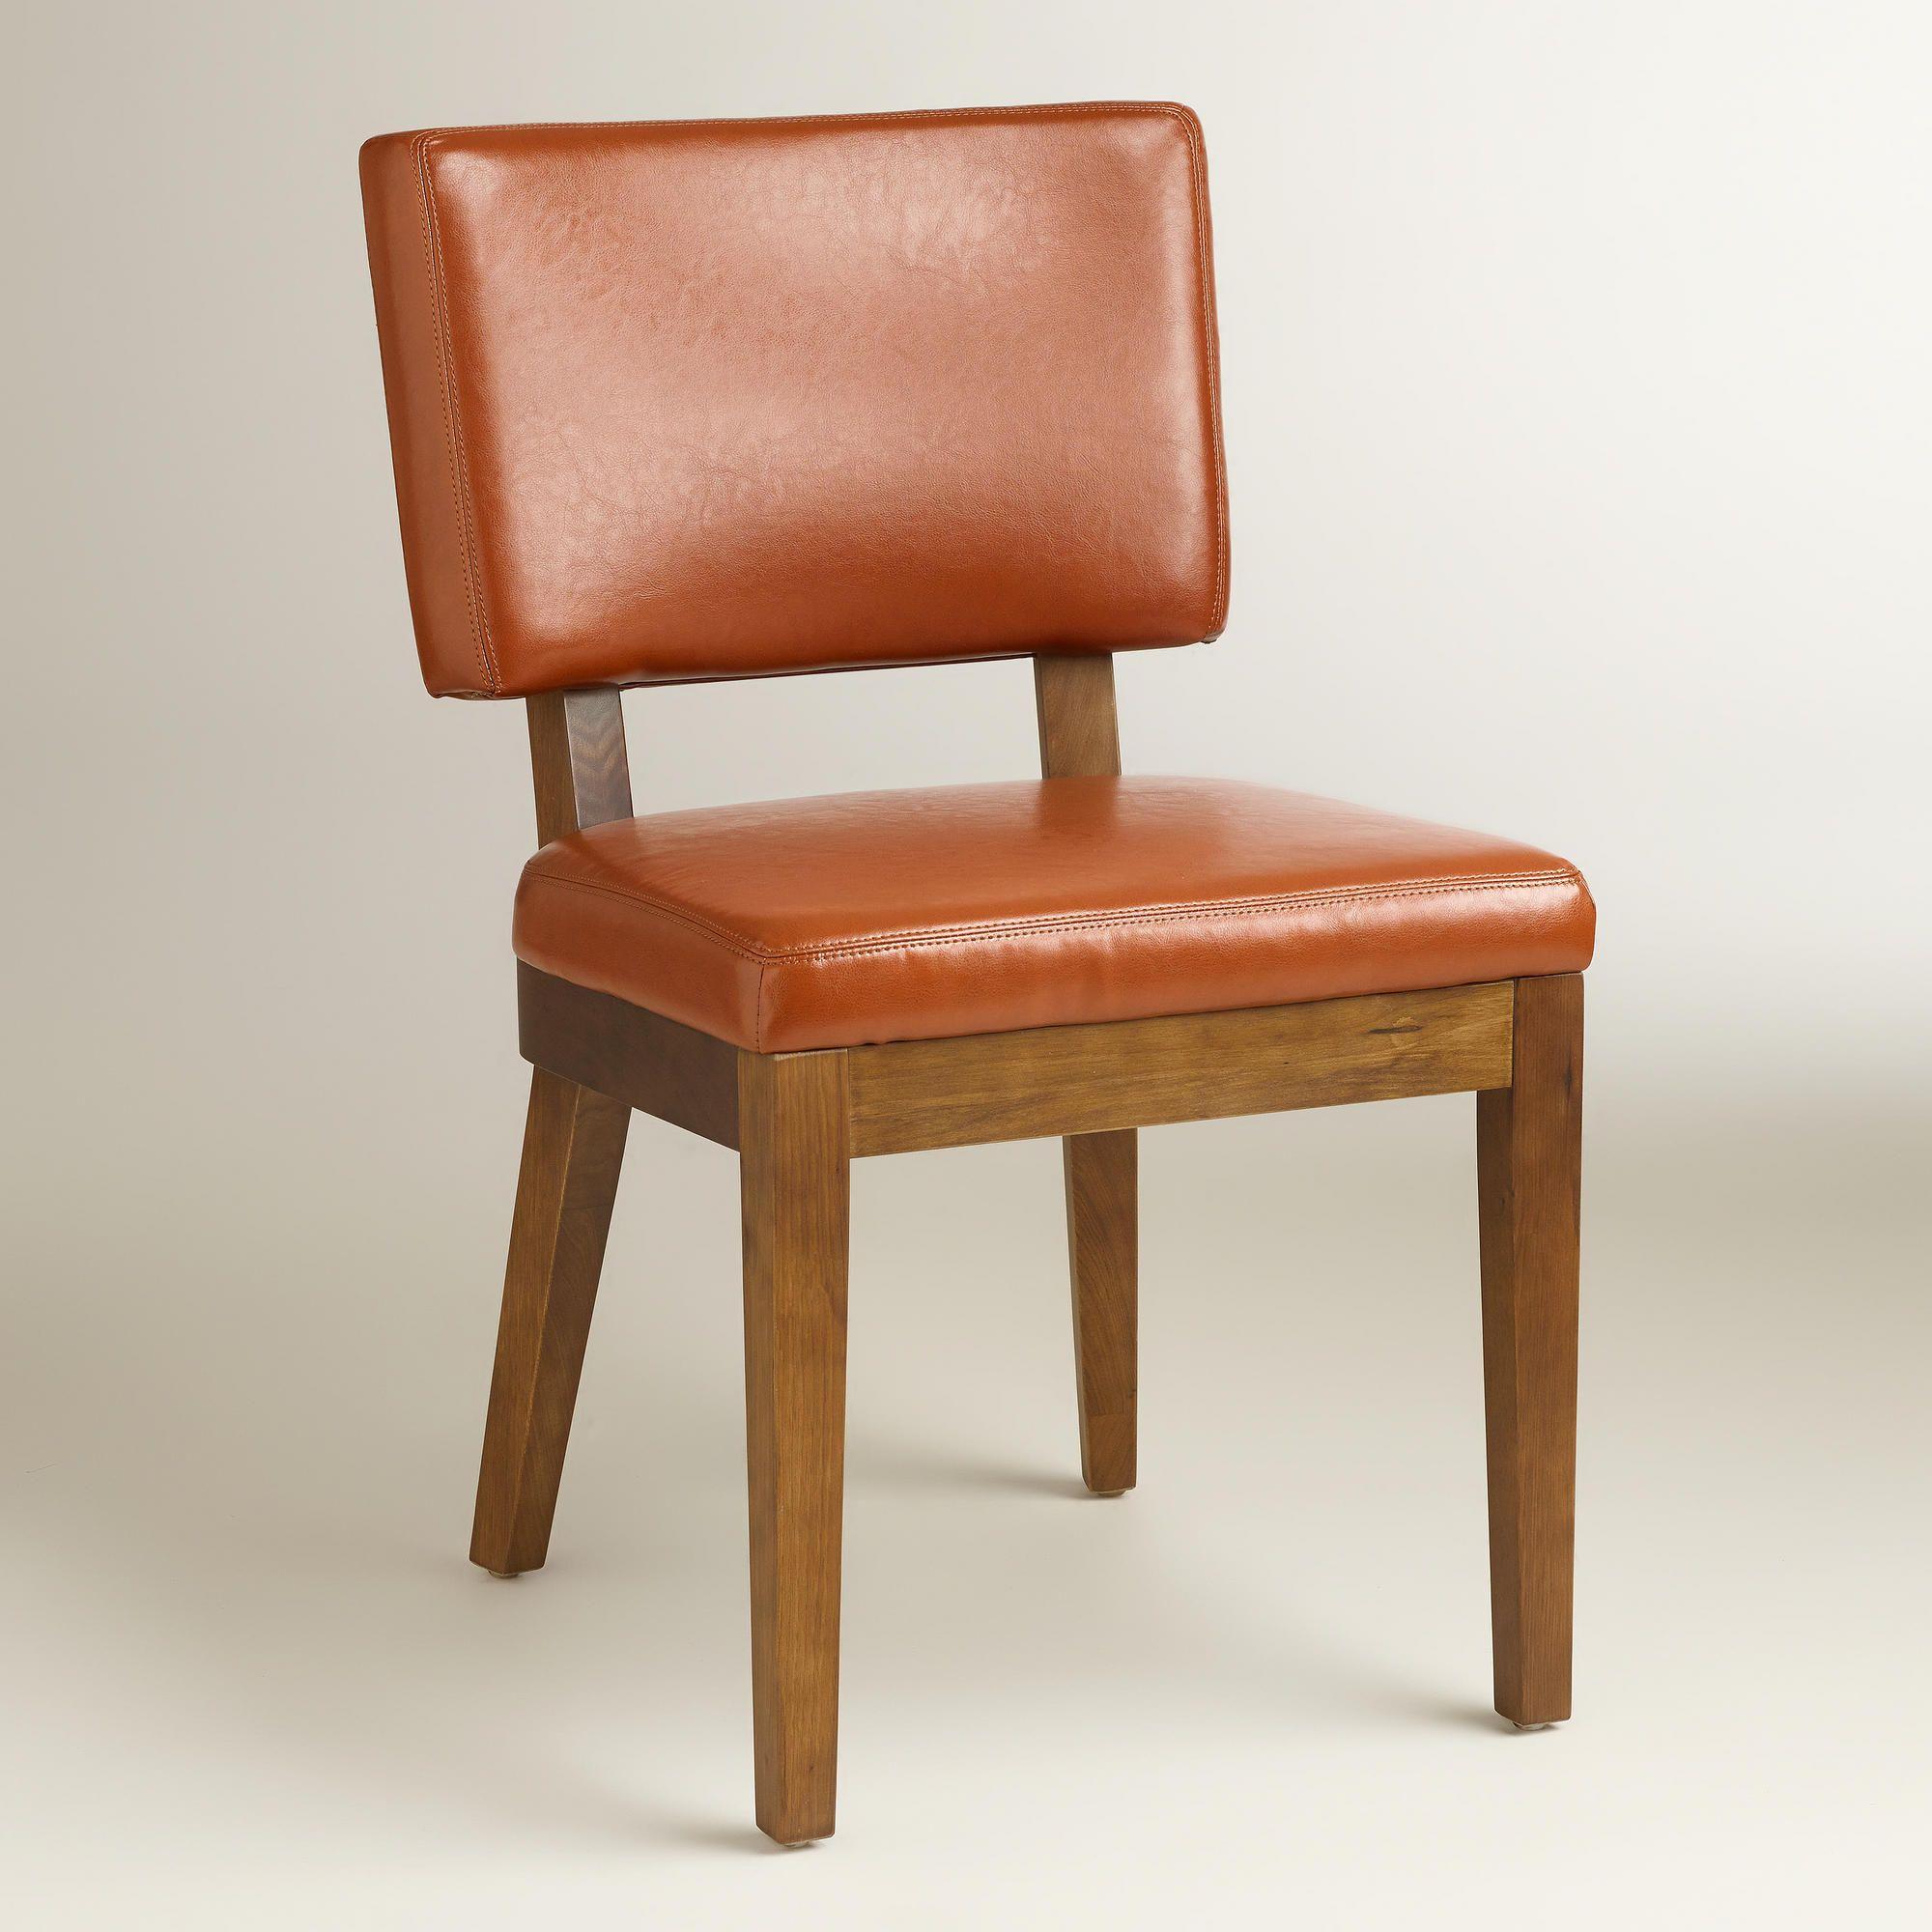 Attirant Cognac Bonded Leather Sophia Chairs, Set Of 2 | World Market